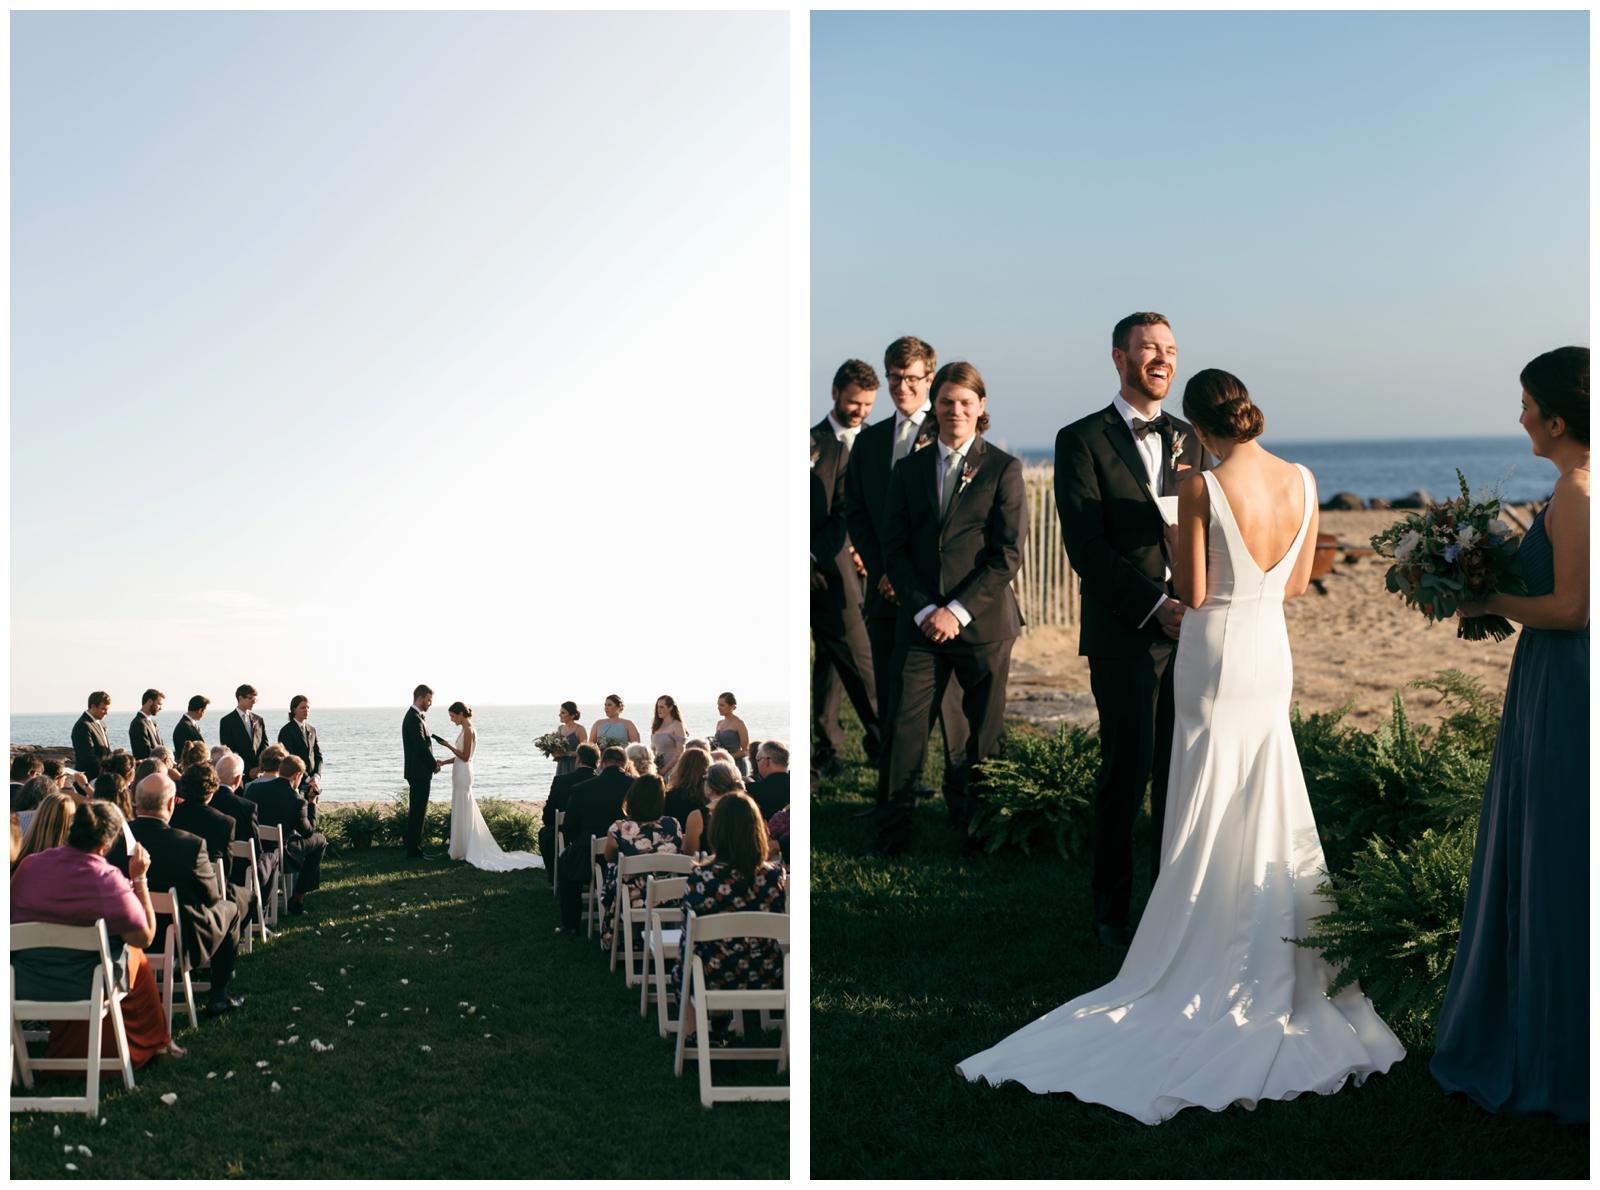 Madison-Beach-Hotel-Wedding-Bailey-Q-Photo-Boston-Wedding-Photographer-038.jpg